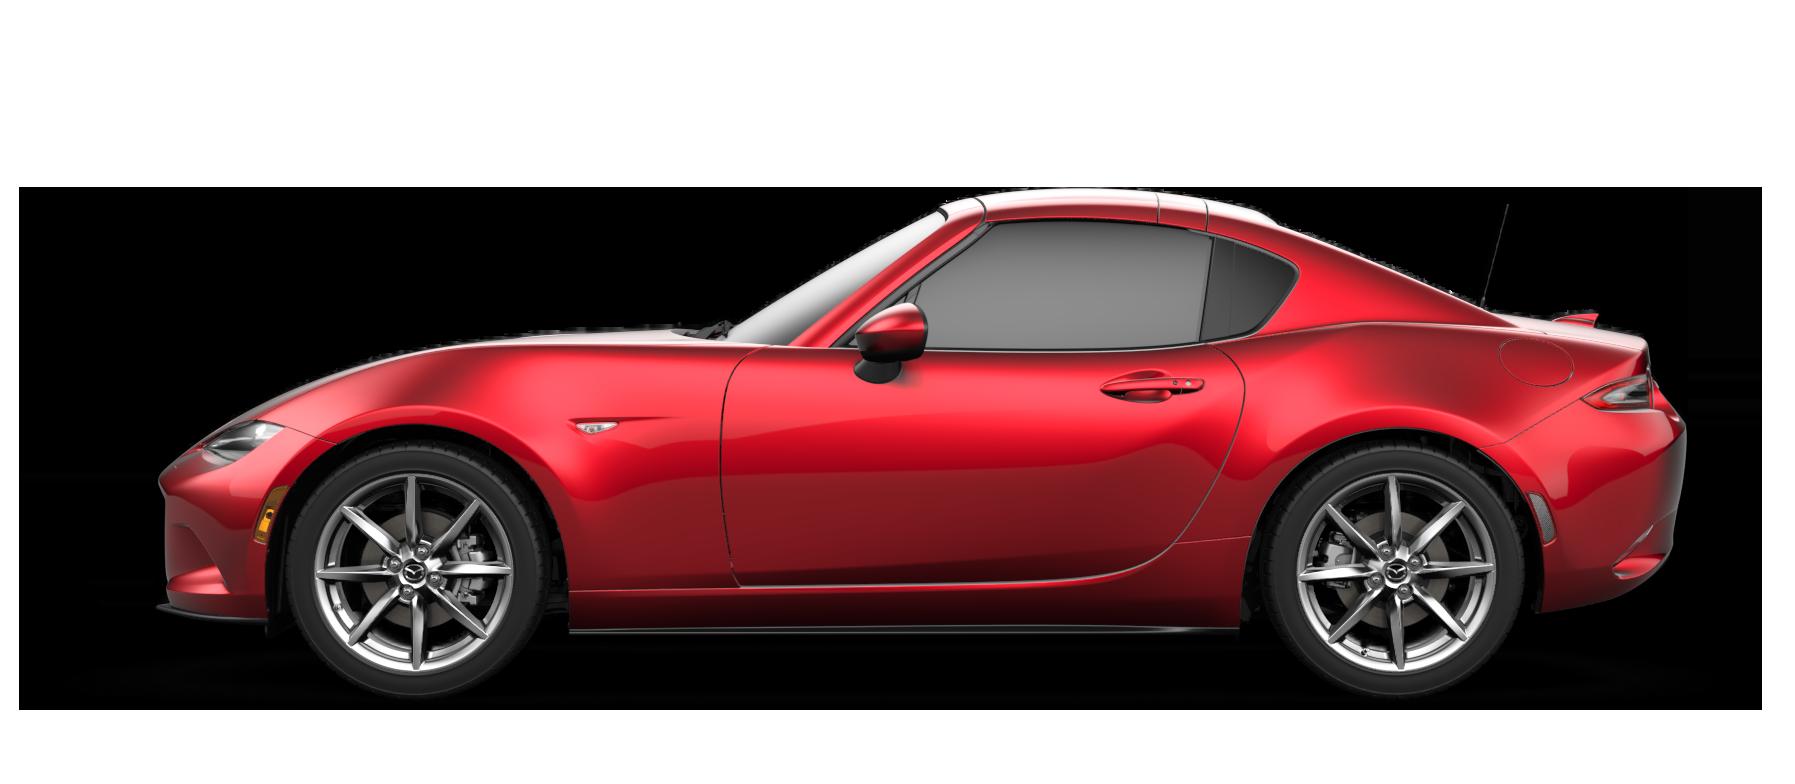 mazda usa official site cars suvs crossovers mazda usa rh mazdausa com Mazda Owner Manuals PDF Mazda Logo